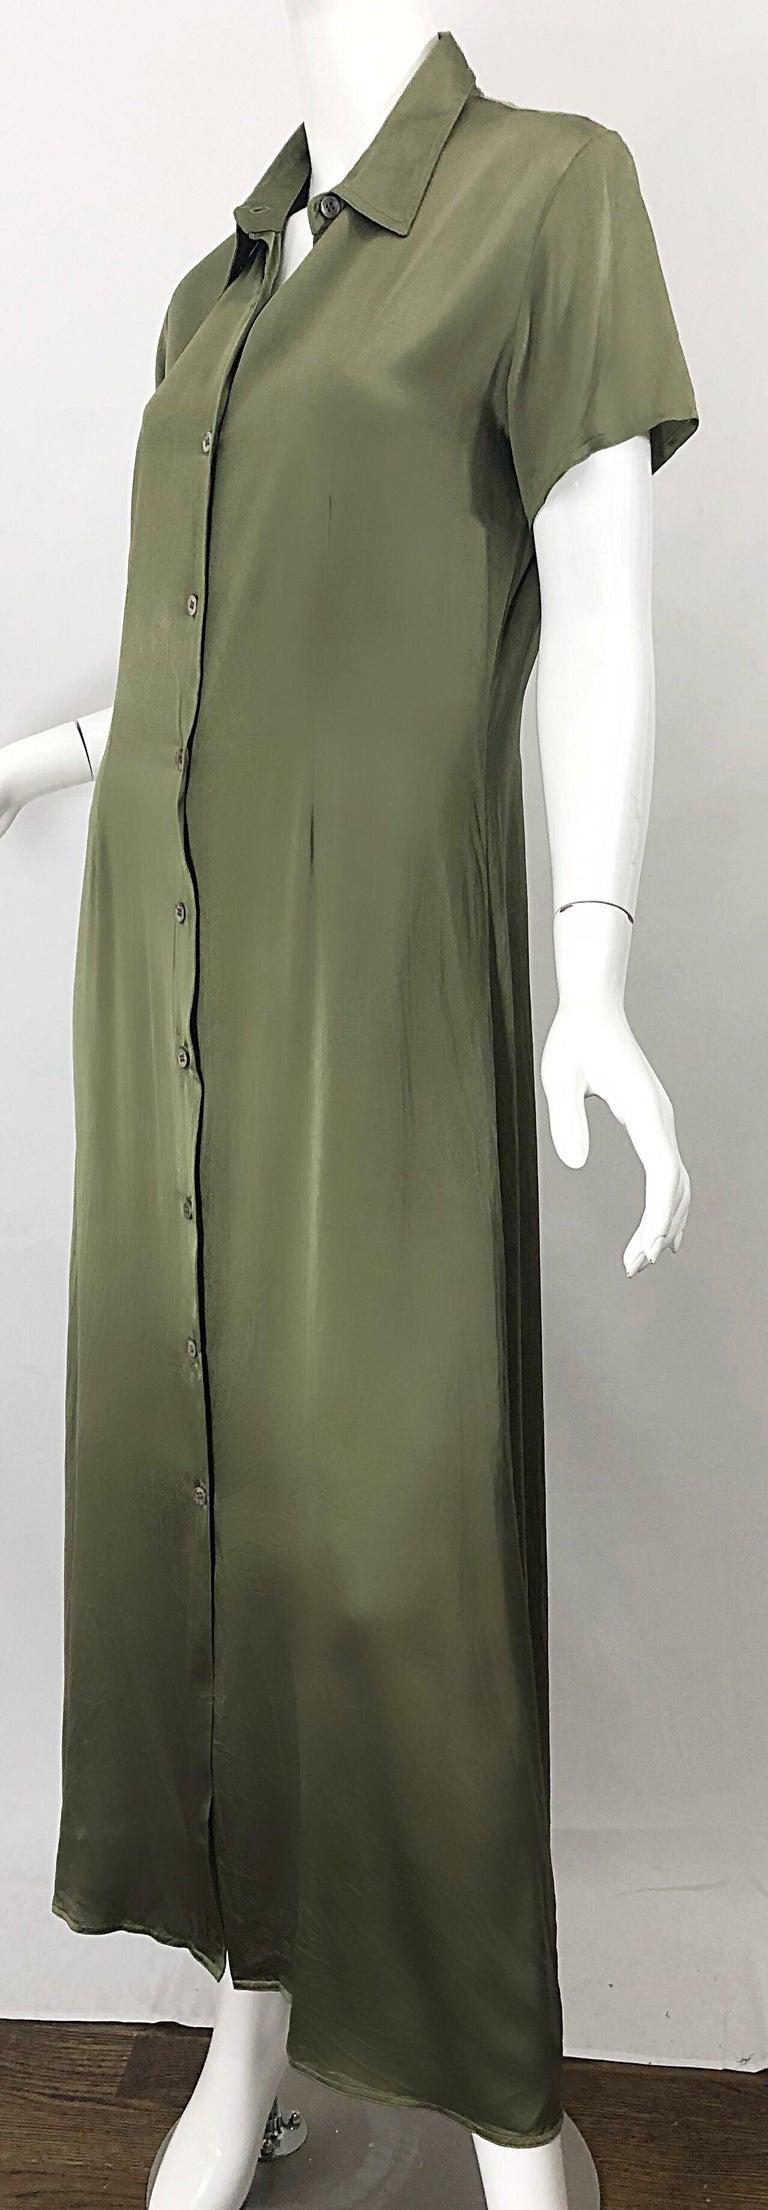 1970s Halston Olive Green Liquid Silk Vintage 70s Short Sleeve Maxi Shirt Dress For Sale 5